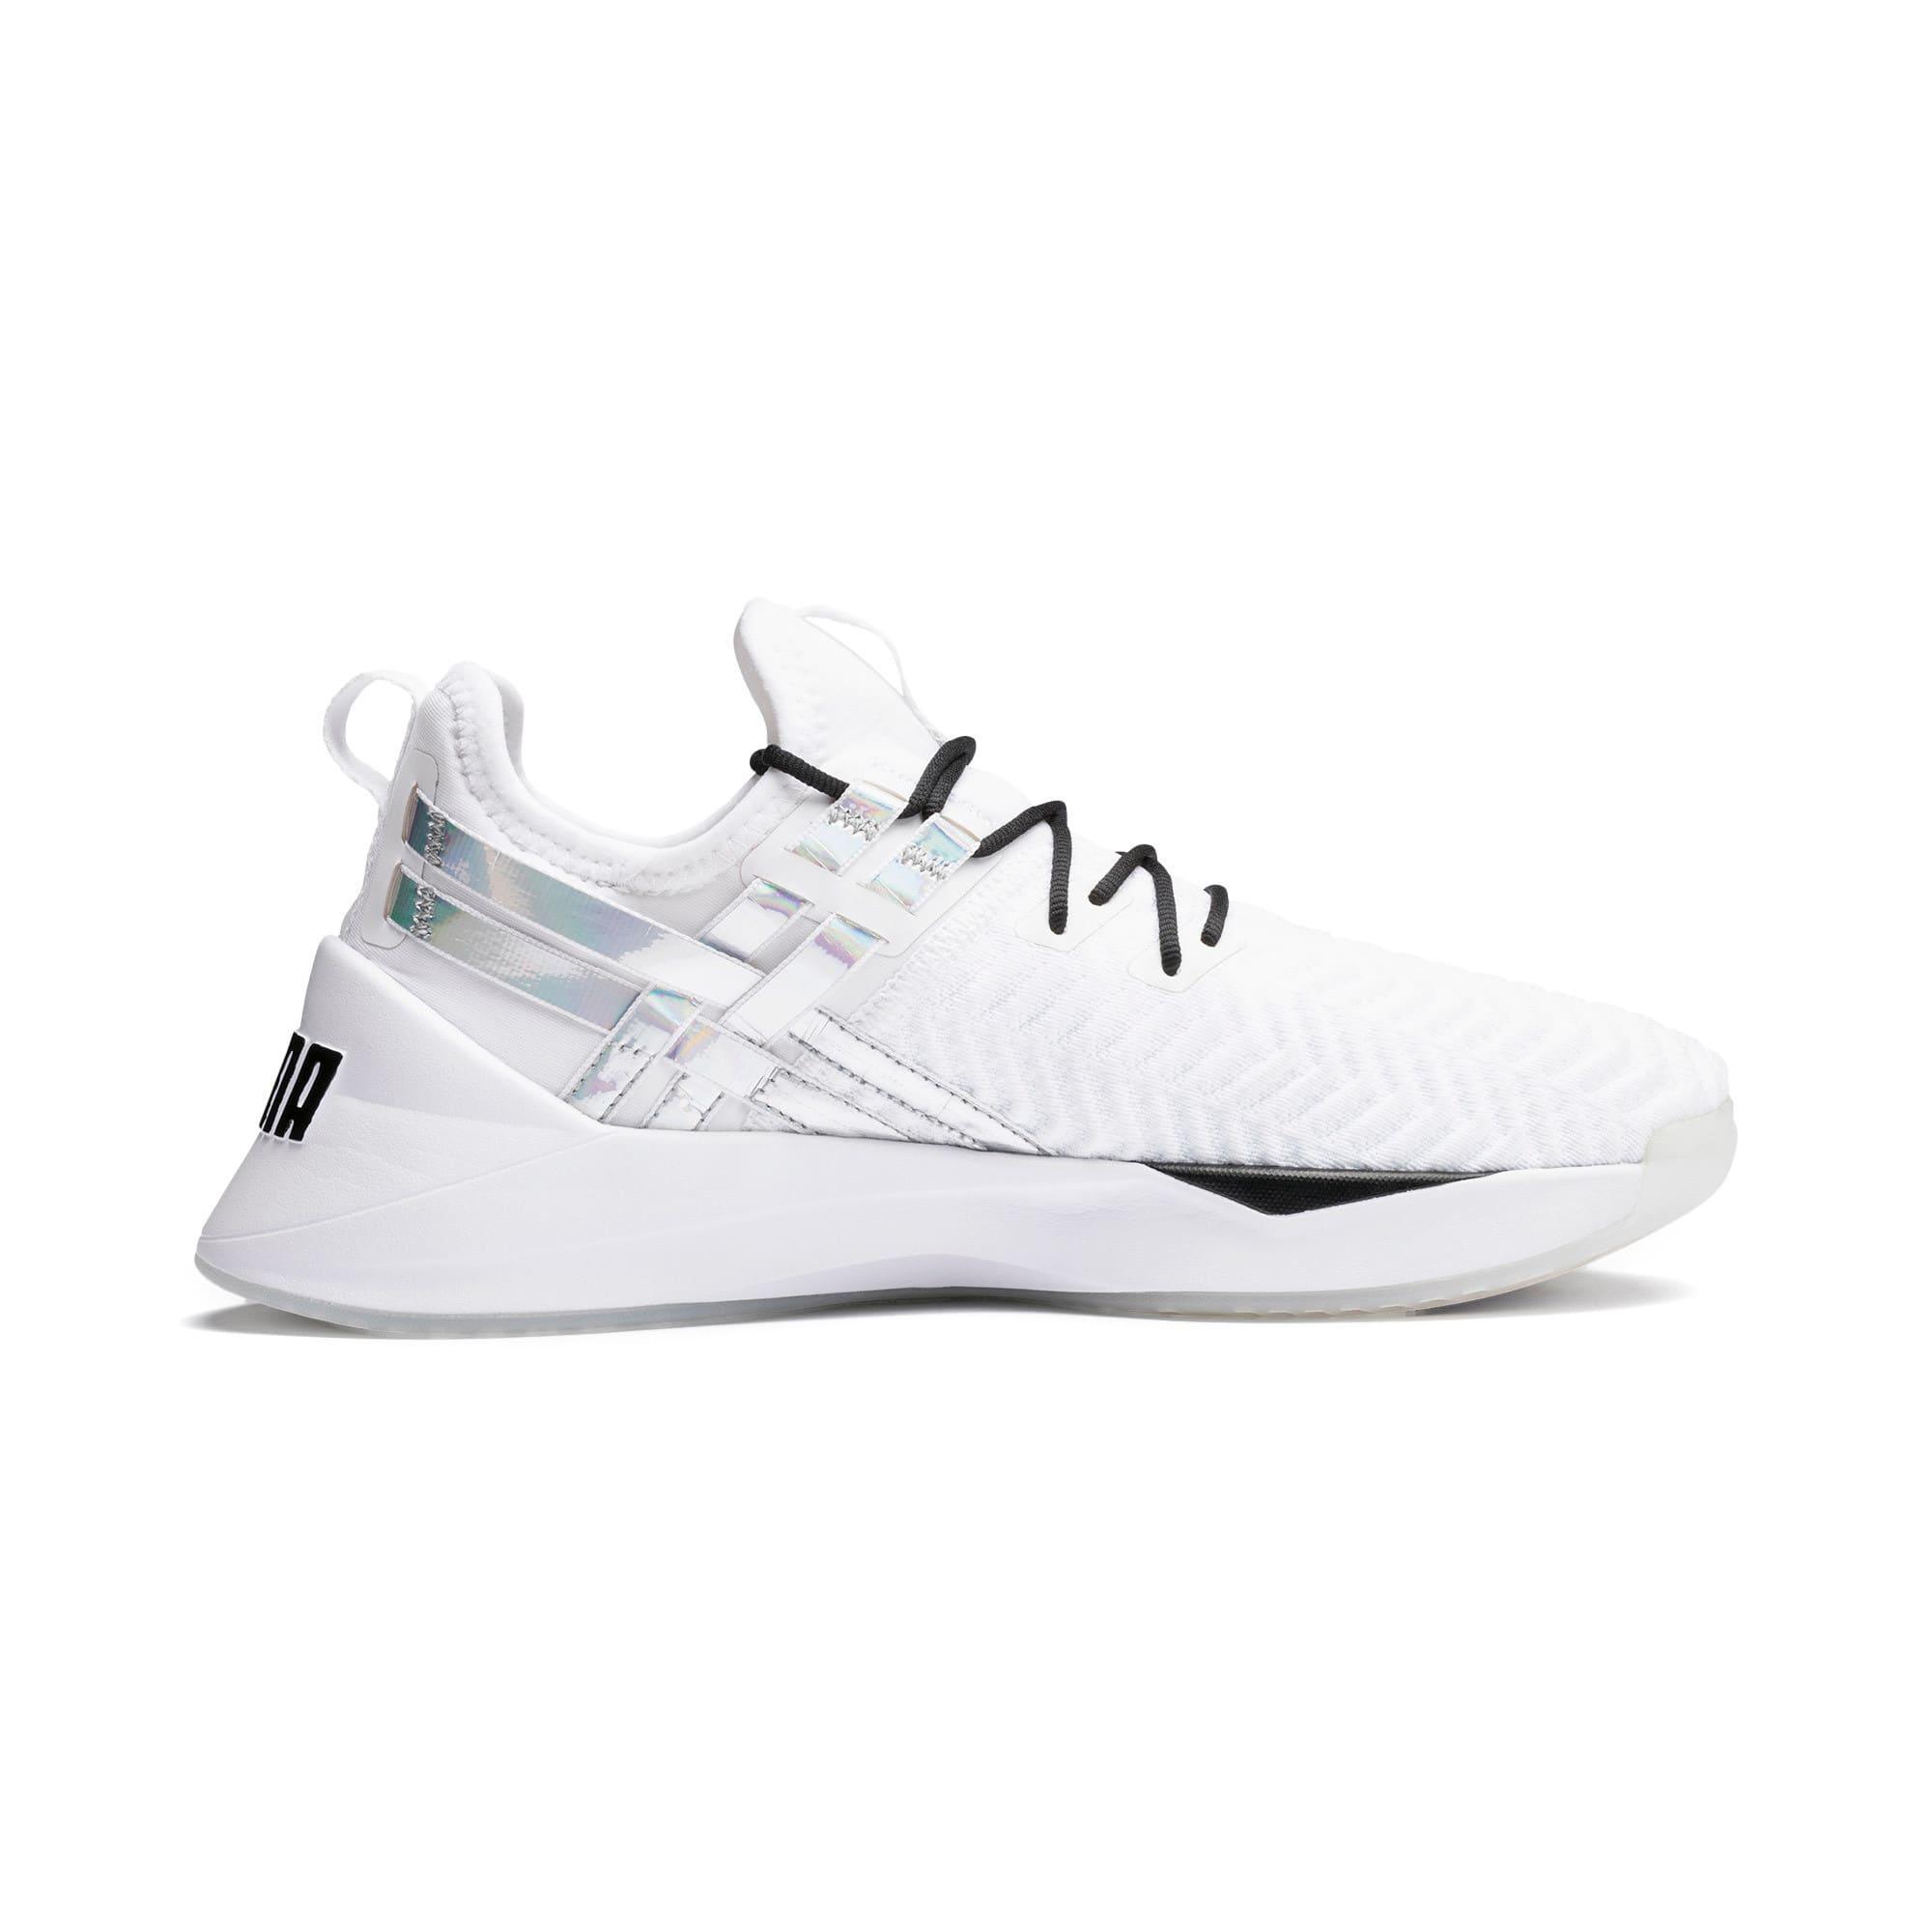 Thumbnail 6 of Jaab XT Iridescent Trailblazer Women's Training Shoes, Puma White-Puma Black, medium